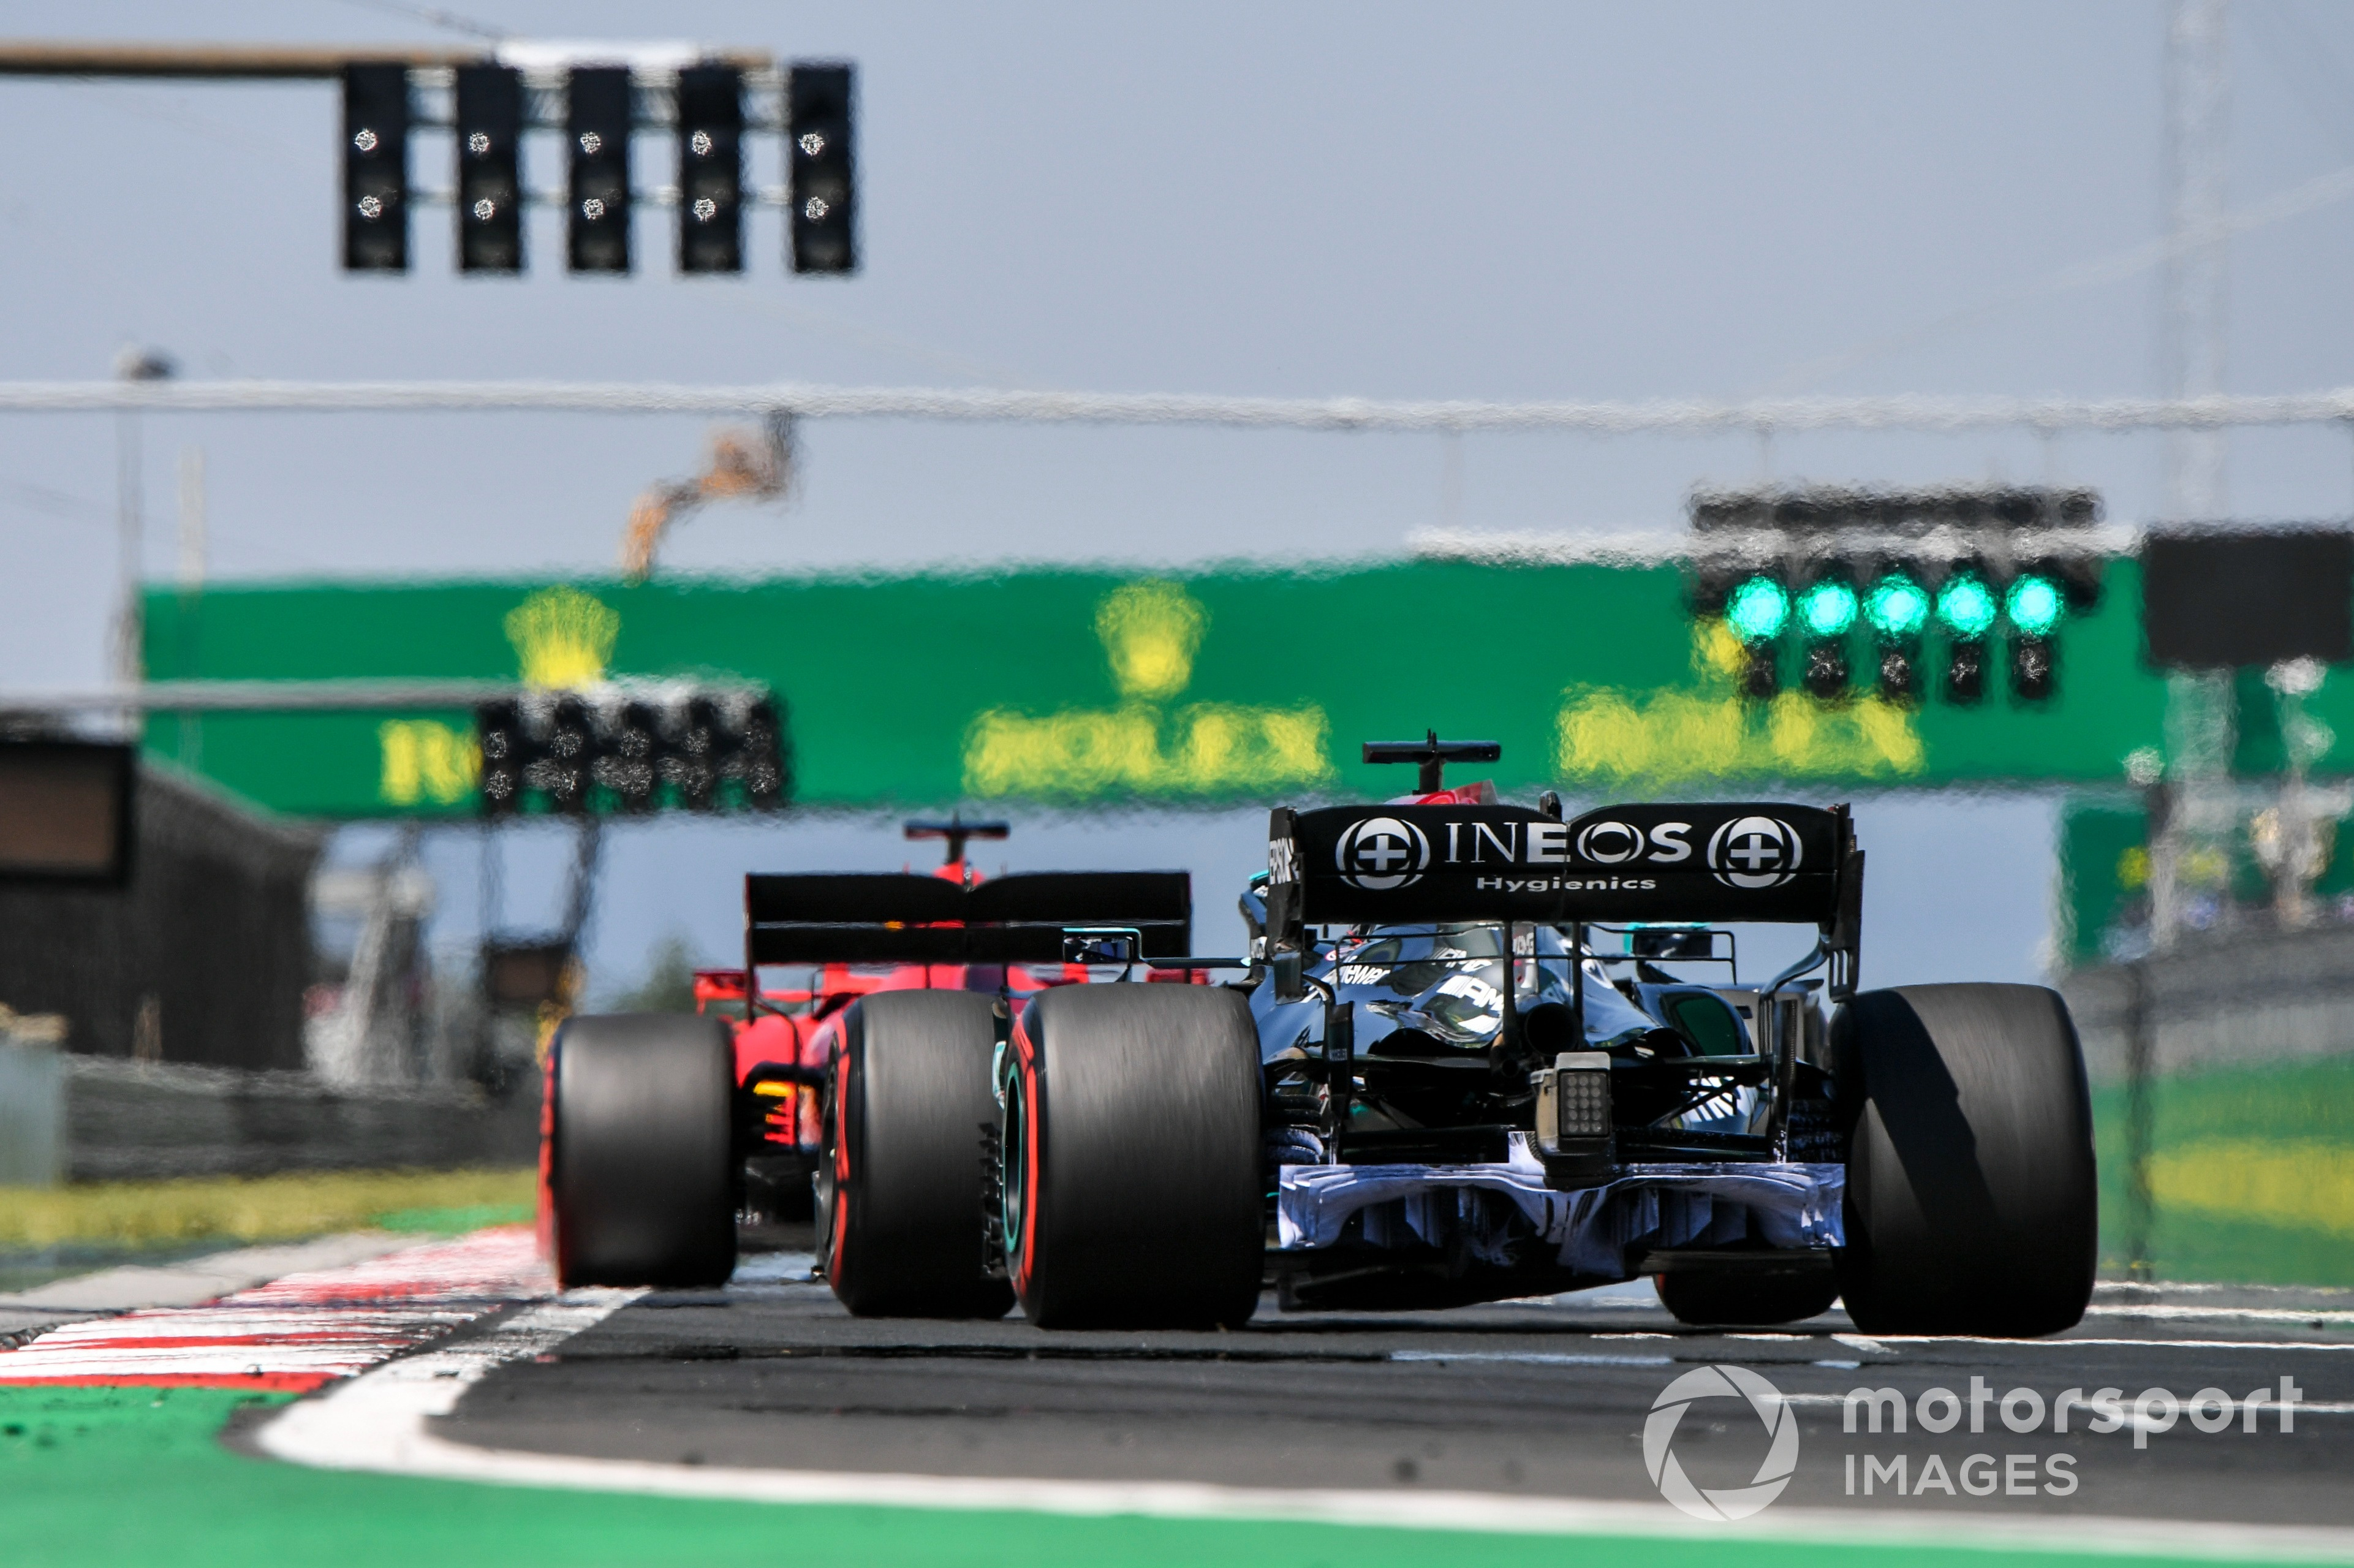 Ferrari's Charles Leclerc leads Lewis Hamilton in the Mercedes, 2021 Hungarian GP